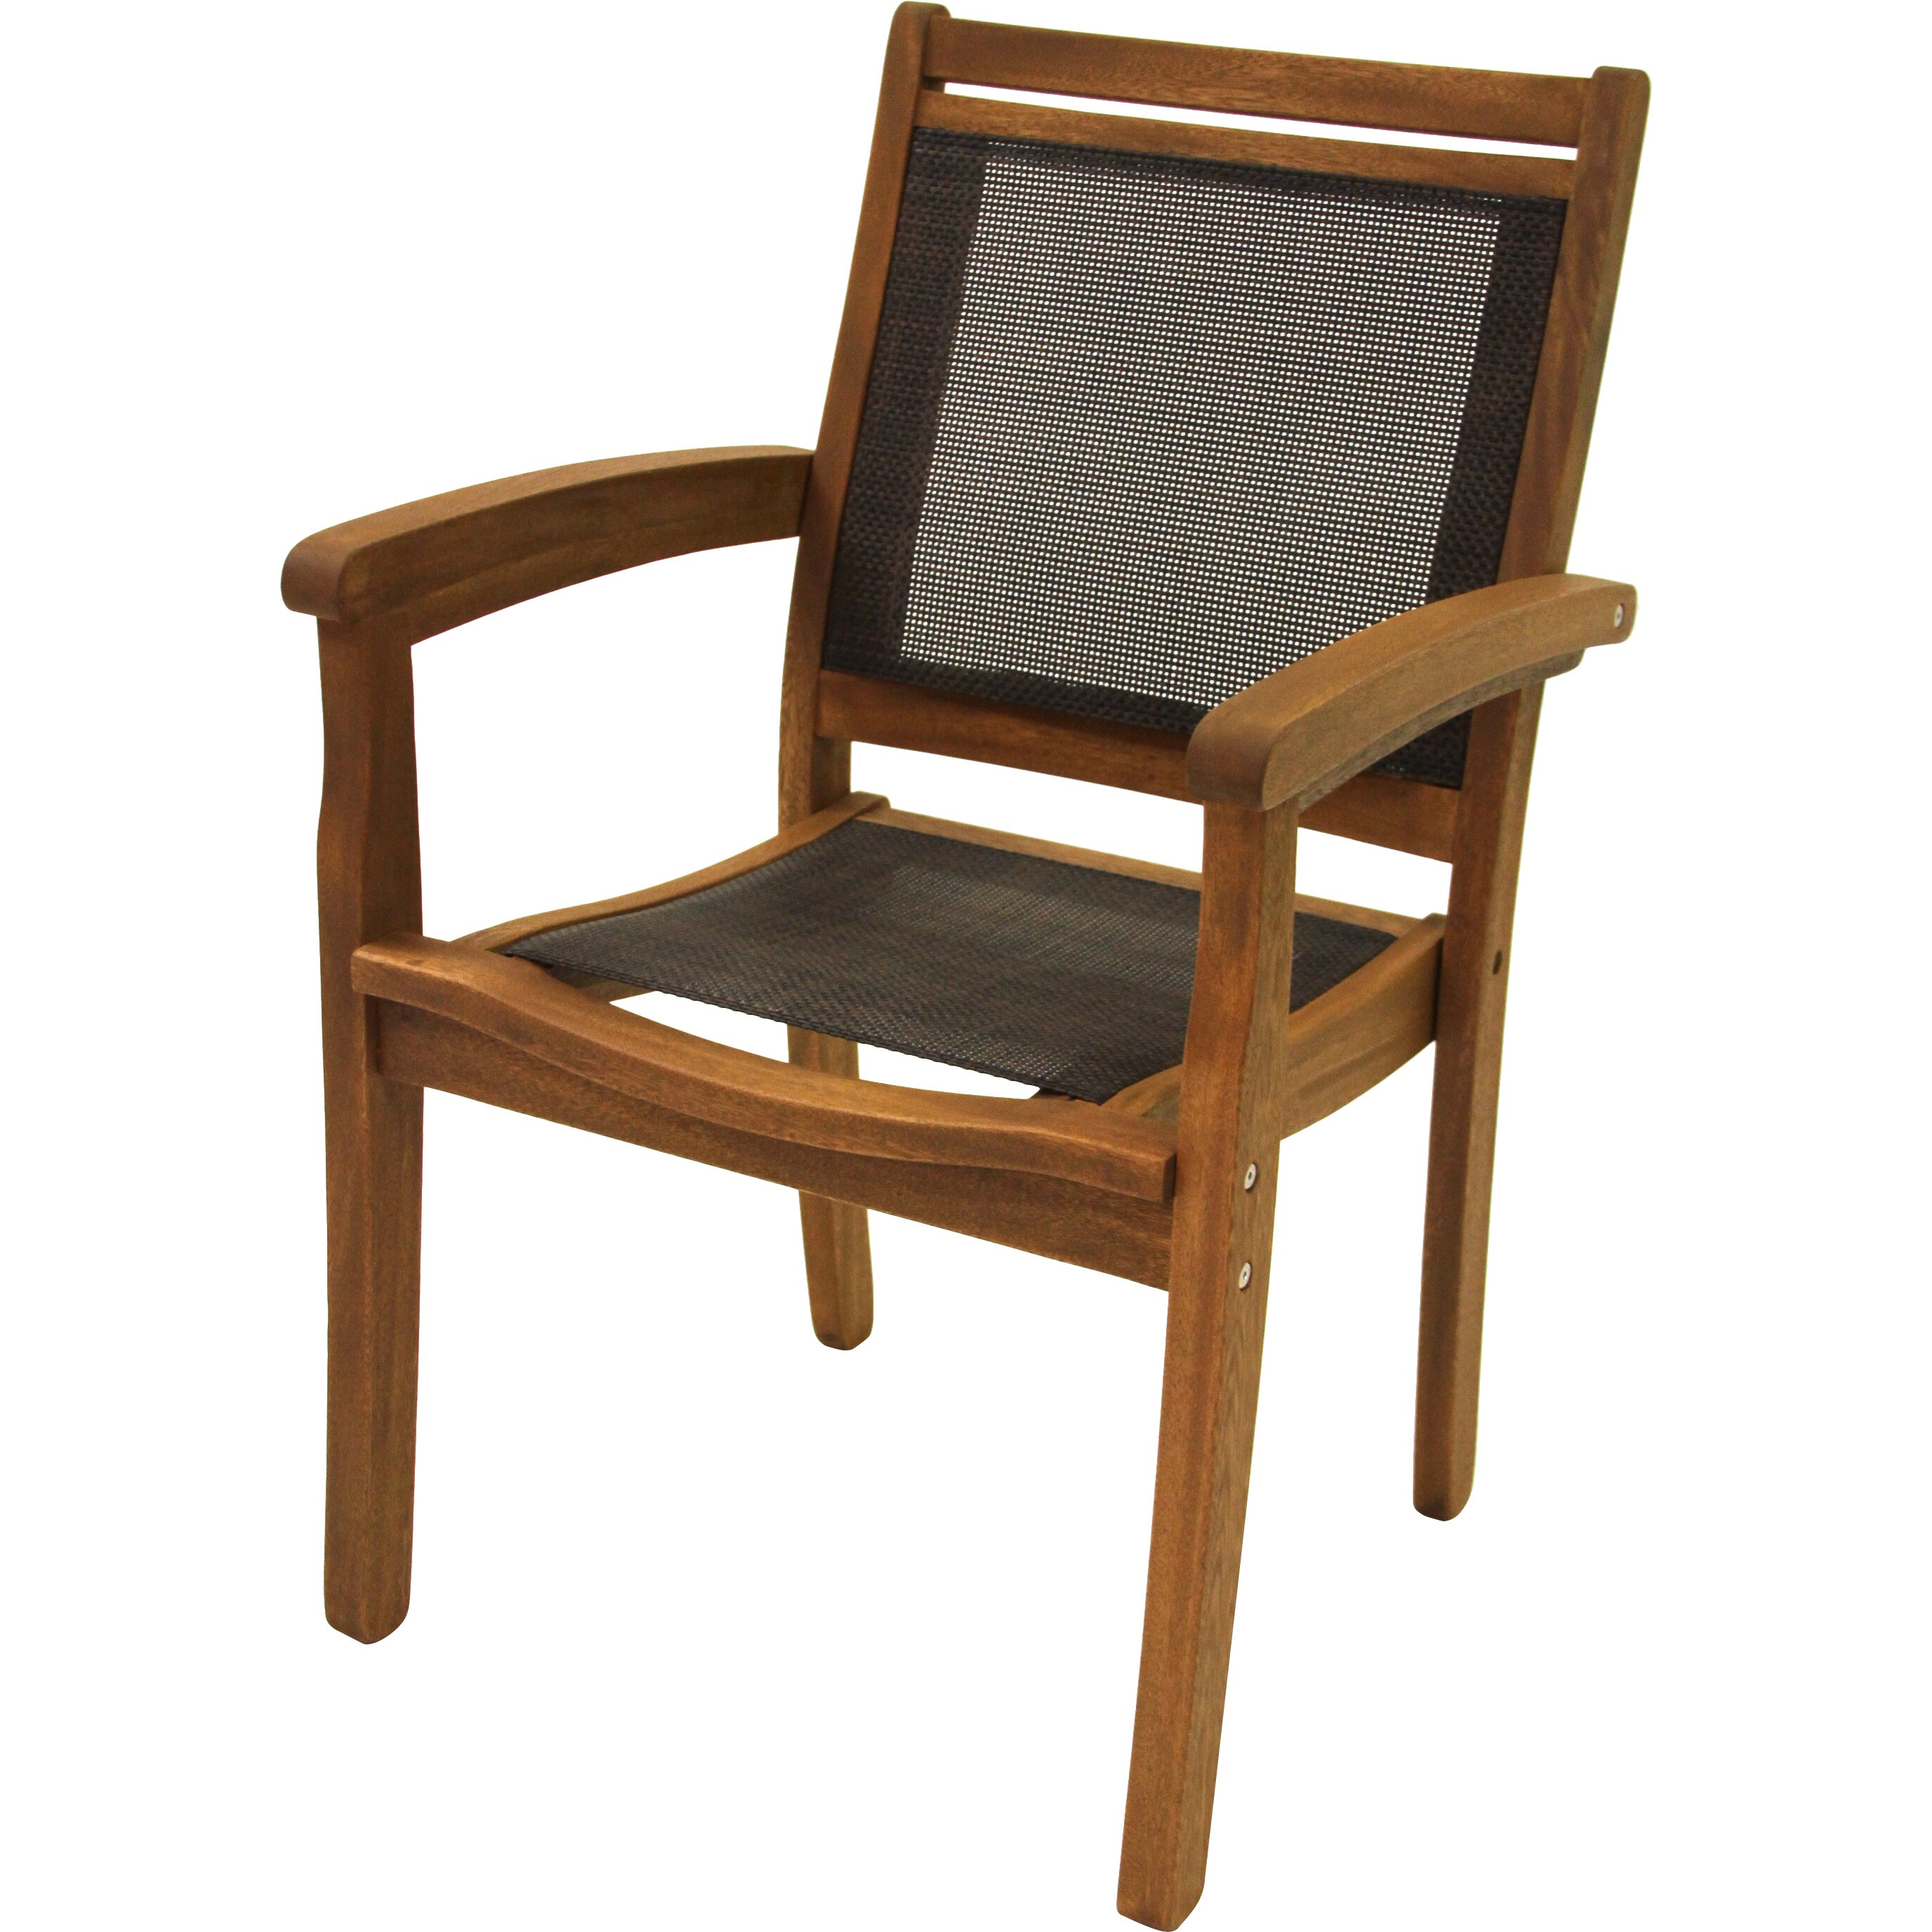 Outdoor interiors sling and eucalyptus stackable arm chair reviews wayfair for Outdoor interiors eucalyptus rocking chair